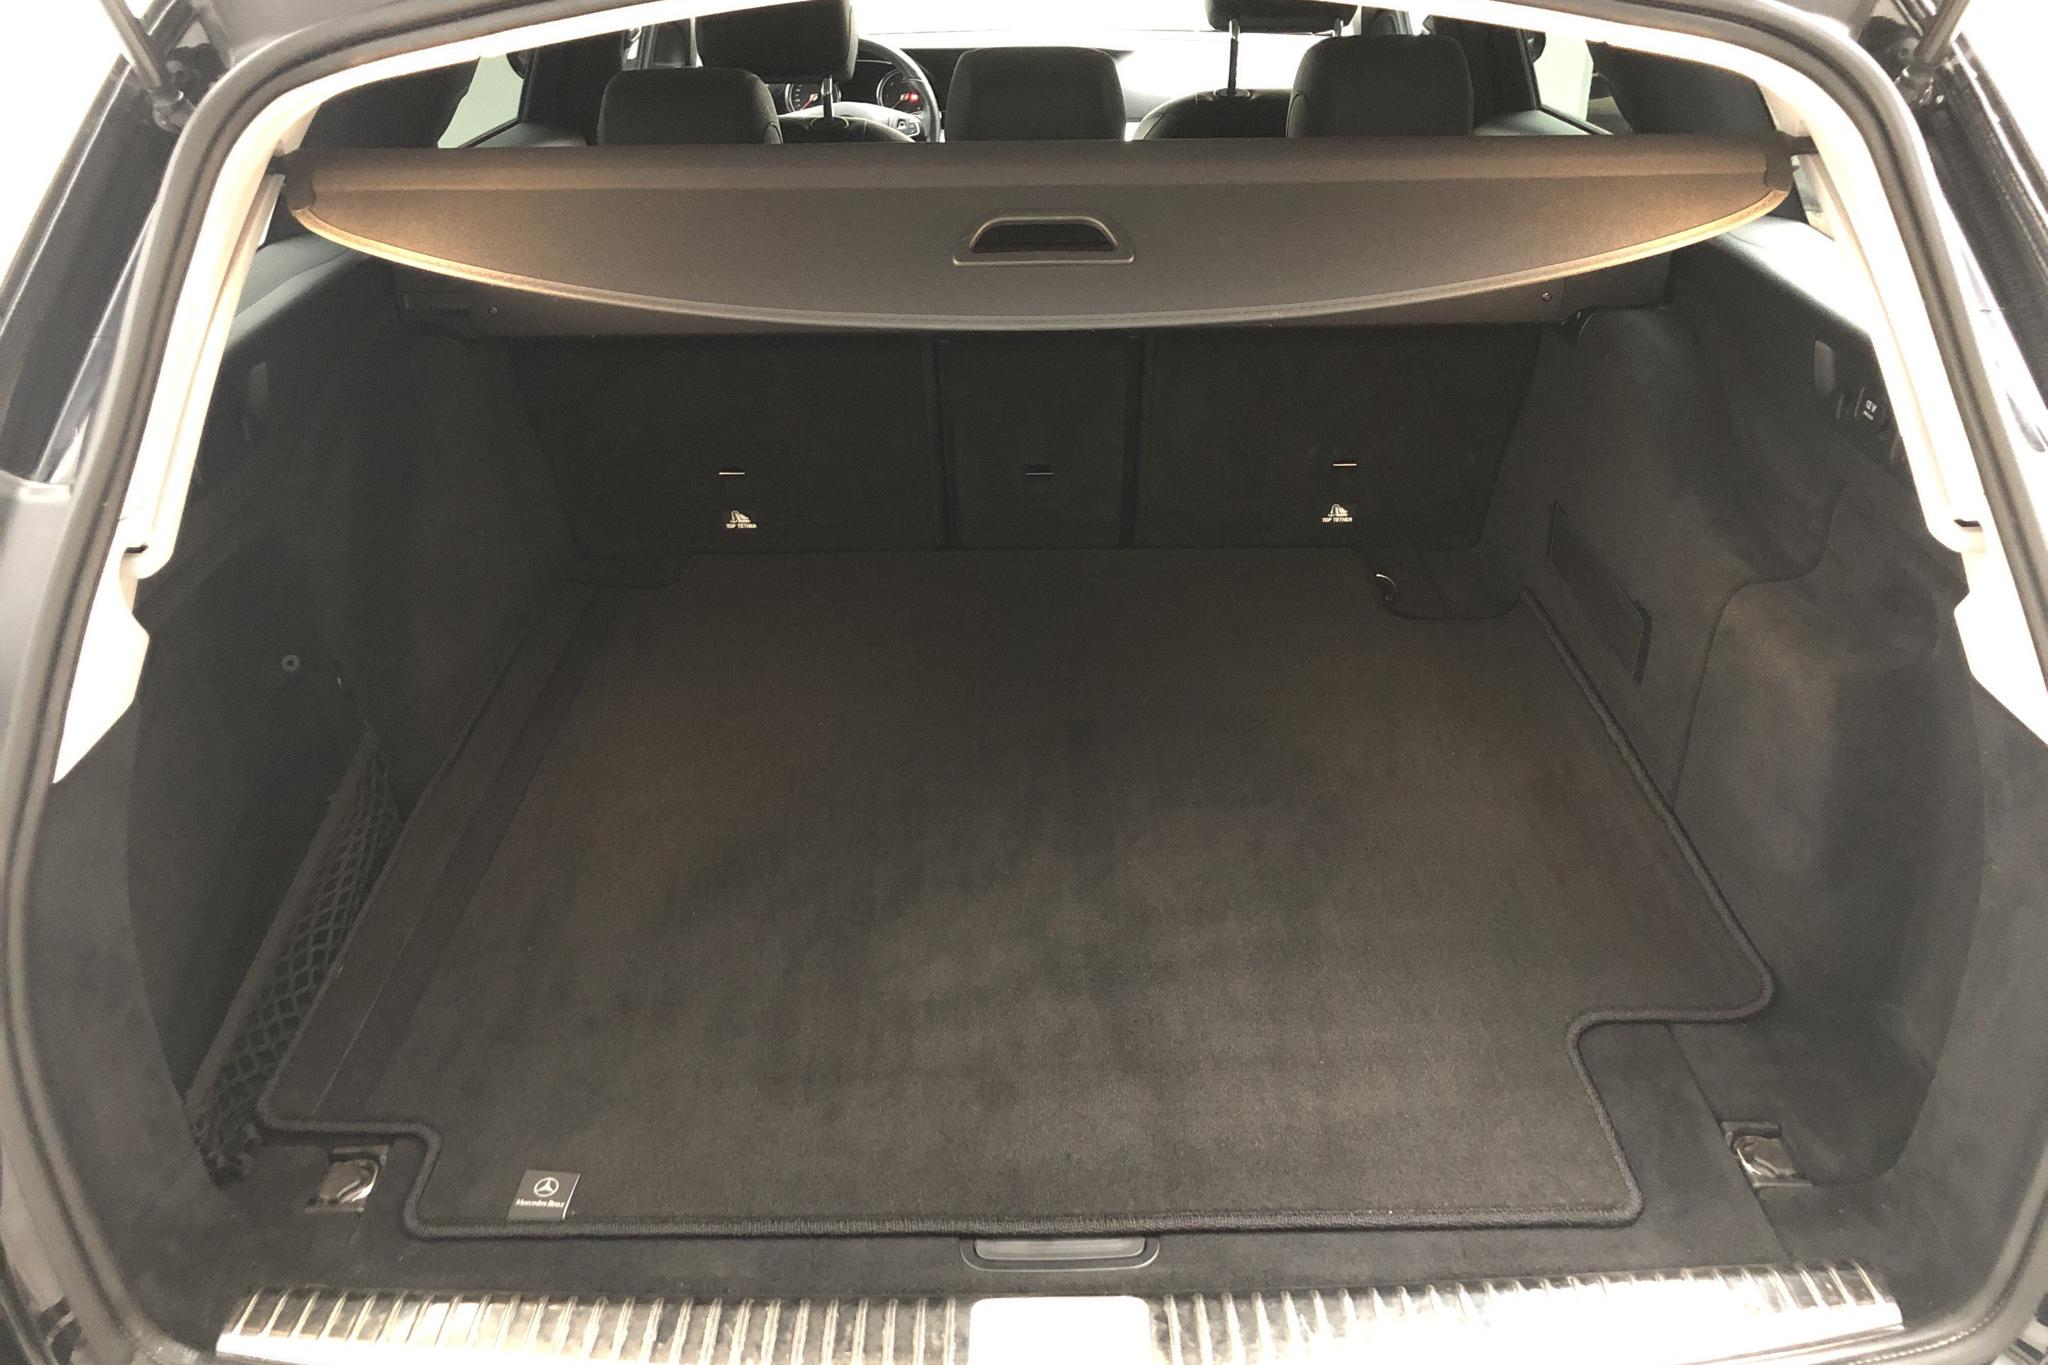 Mercedes E 220 d Kombi S213 (194hk) - 18 733 mil - Automat - svart - 2017